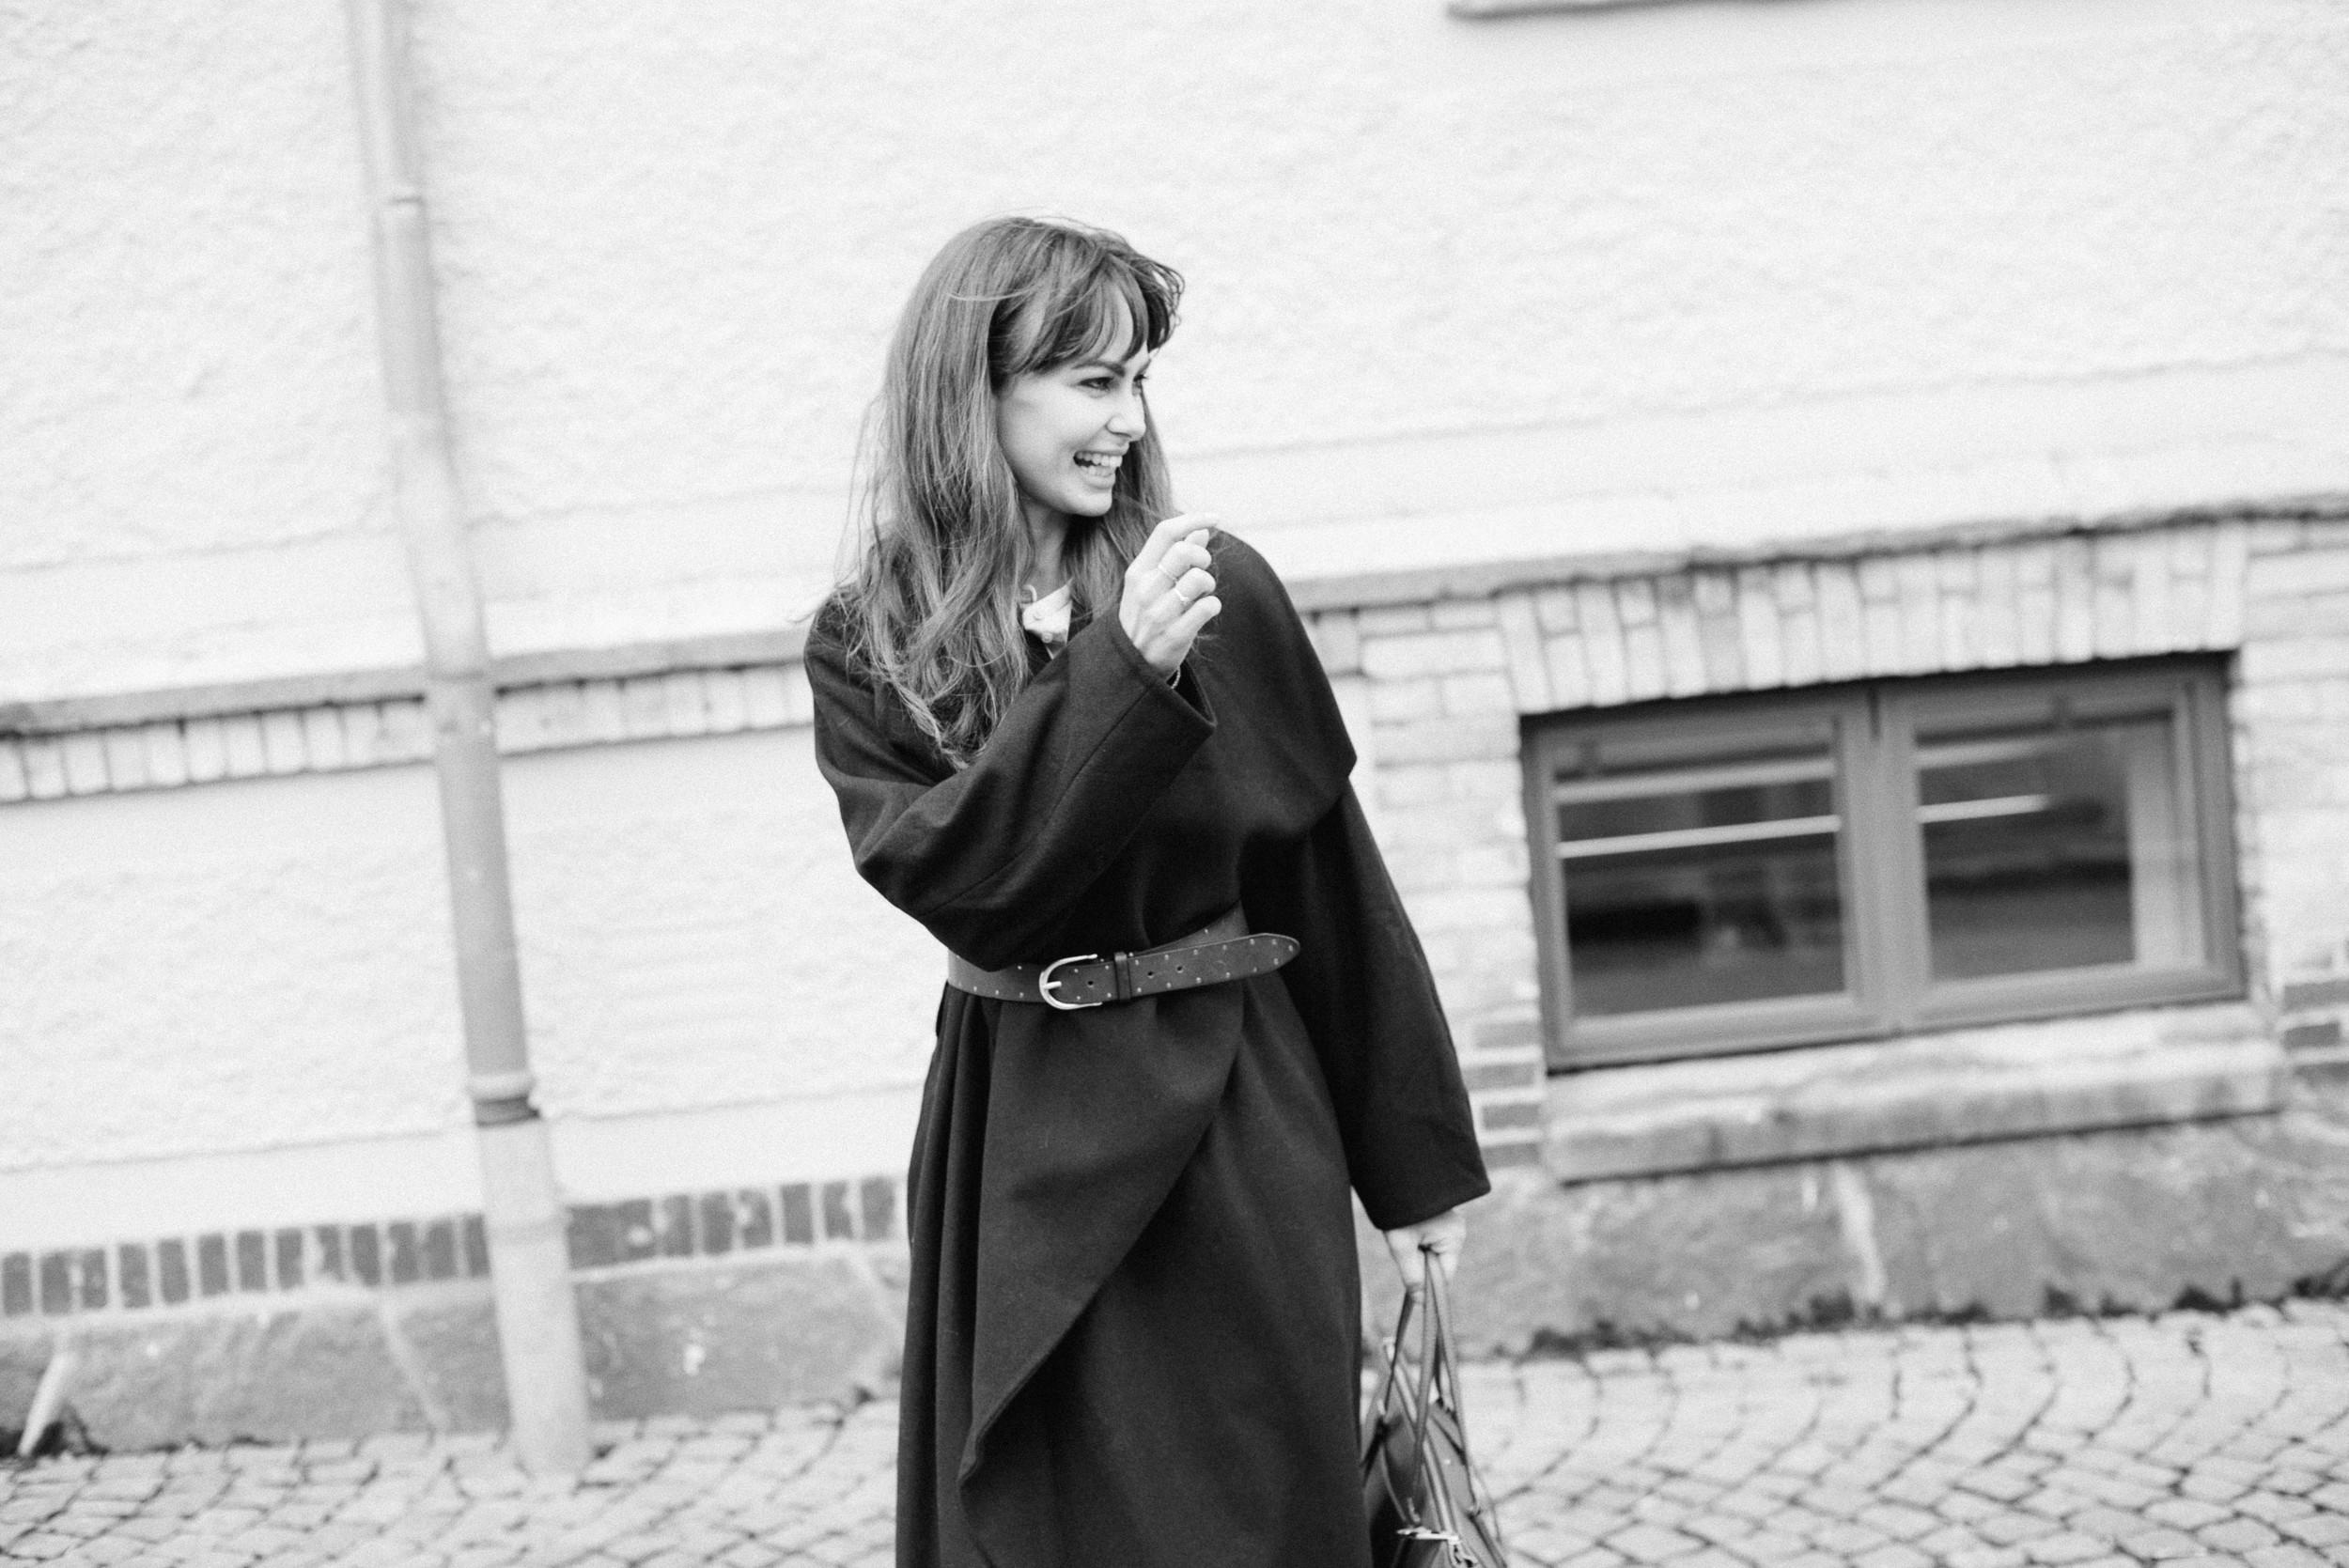 Anna from Avenuemodeller, photo by Carlerikjonas